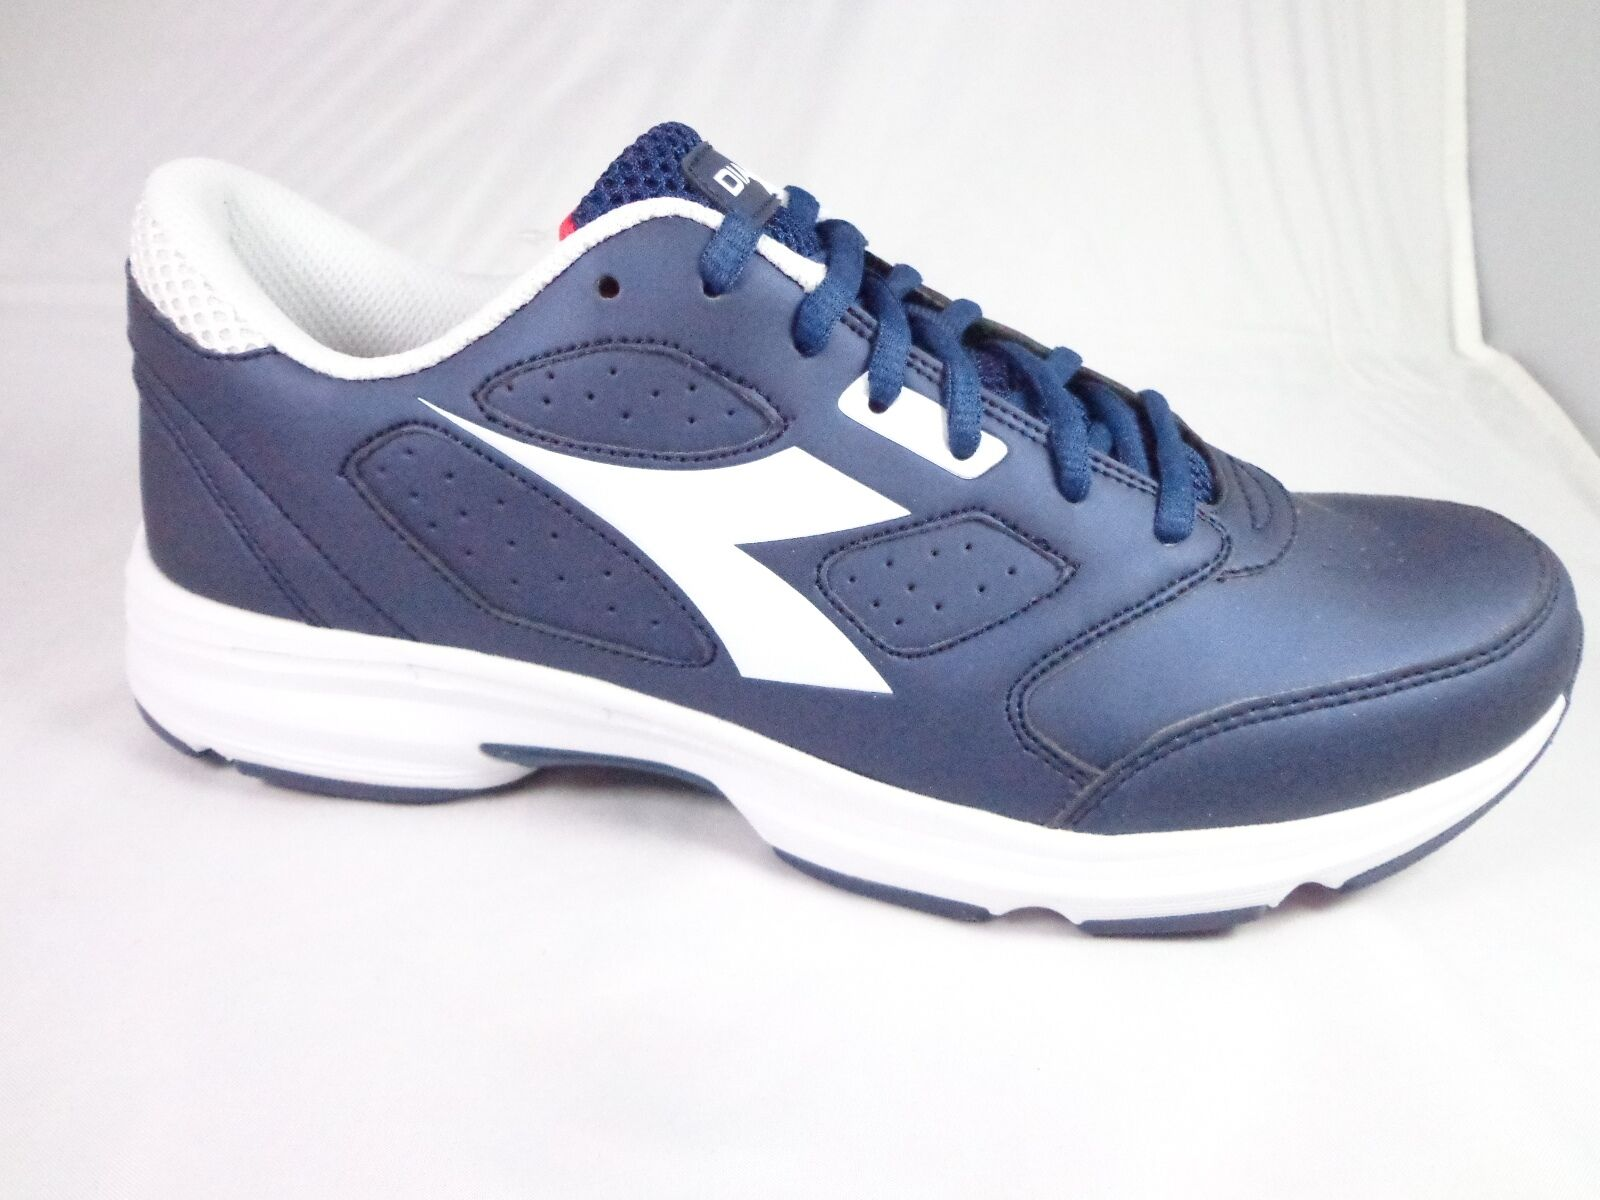 NWOB Diadora  Bright Men's Running Shoe Saltire Navy white Size 8.5 US